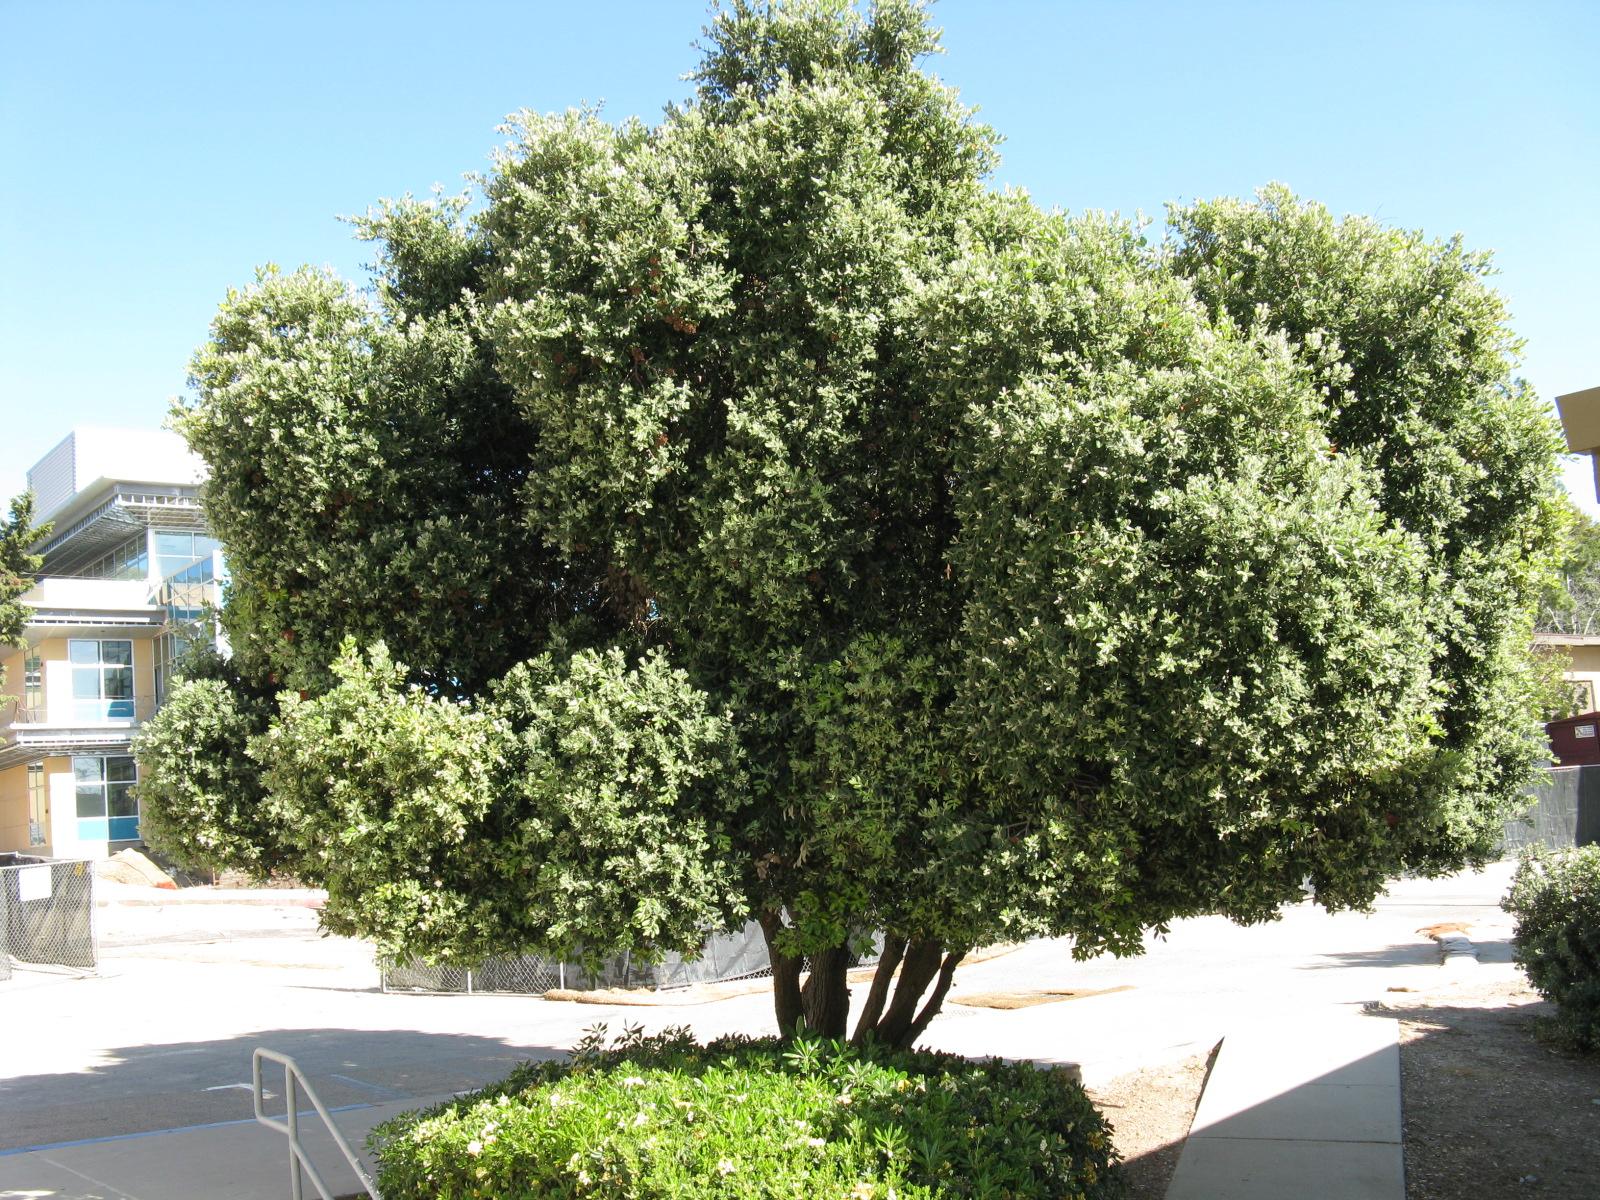 Trees Of Santa Cruz County Metrosideros Excelsa New Zealand